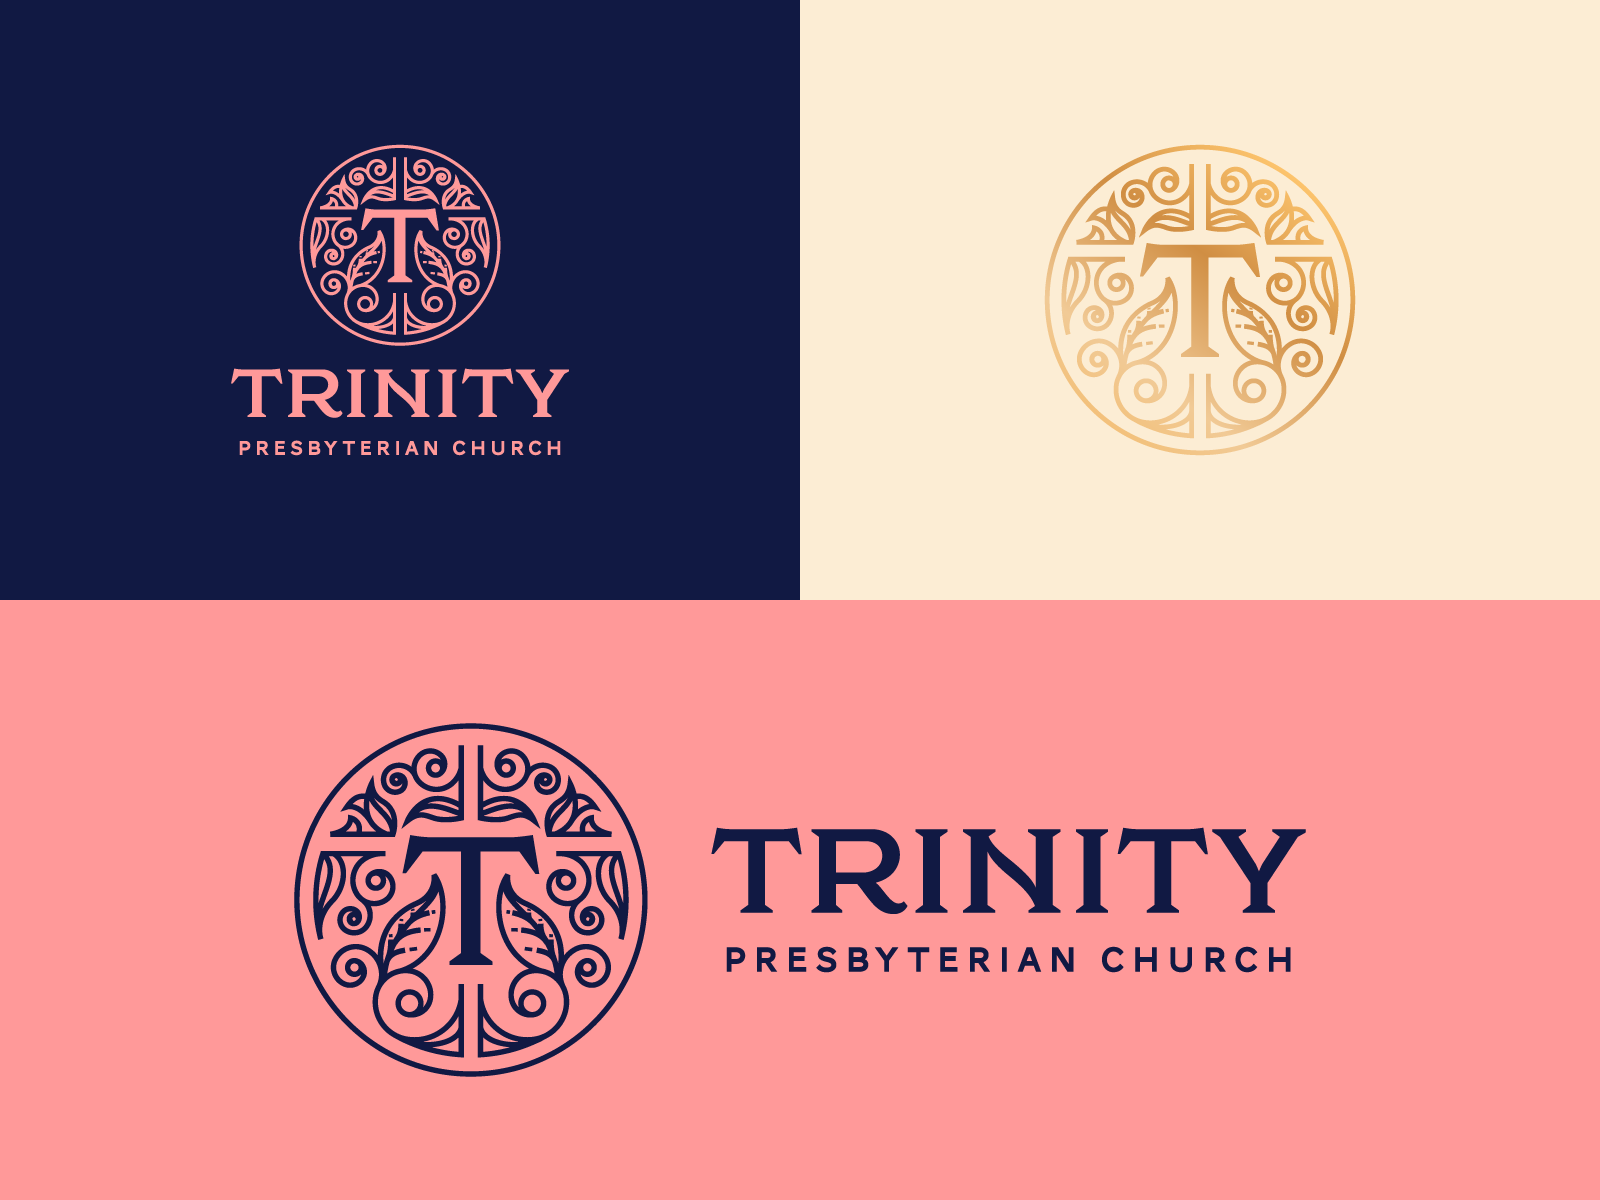 Trinity Presbyterian Church San Diego Church Logo Church Logo Design Church Logo Inspiration